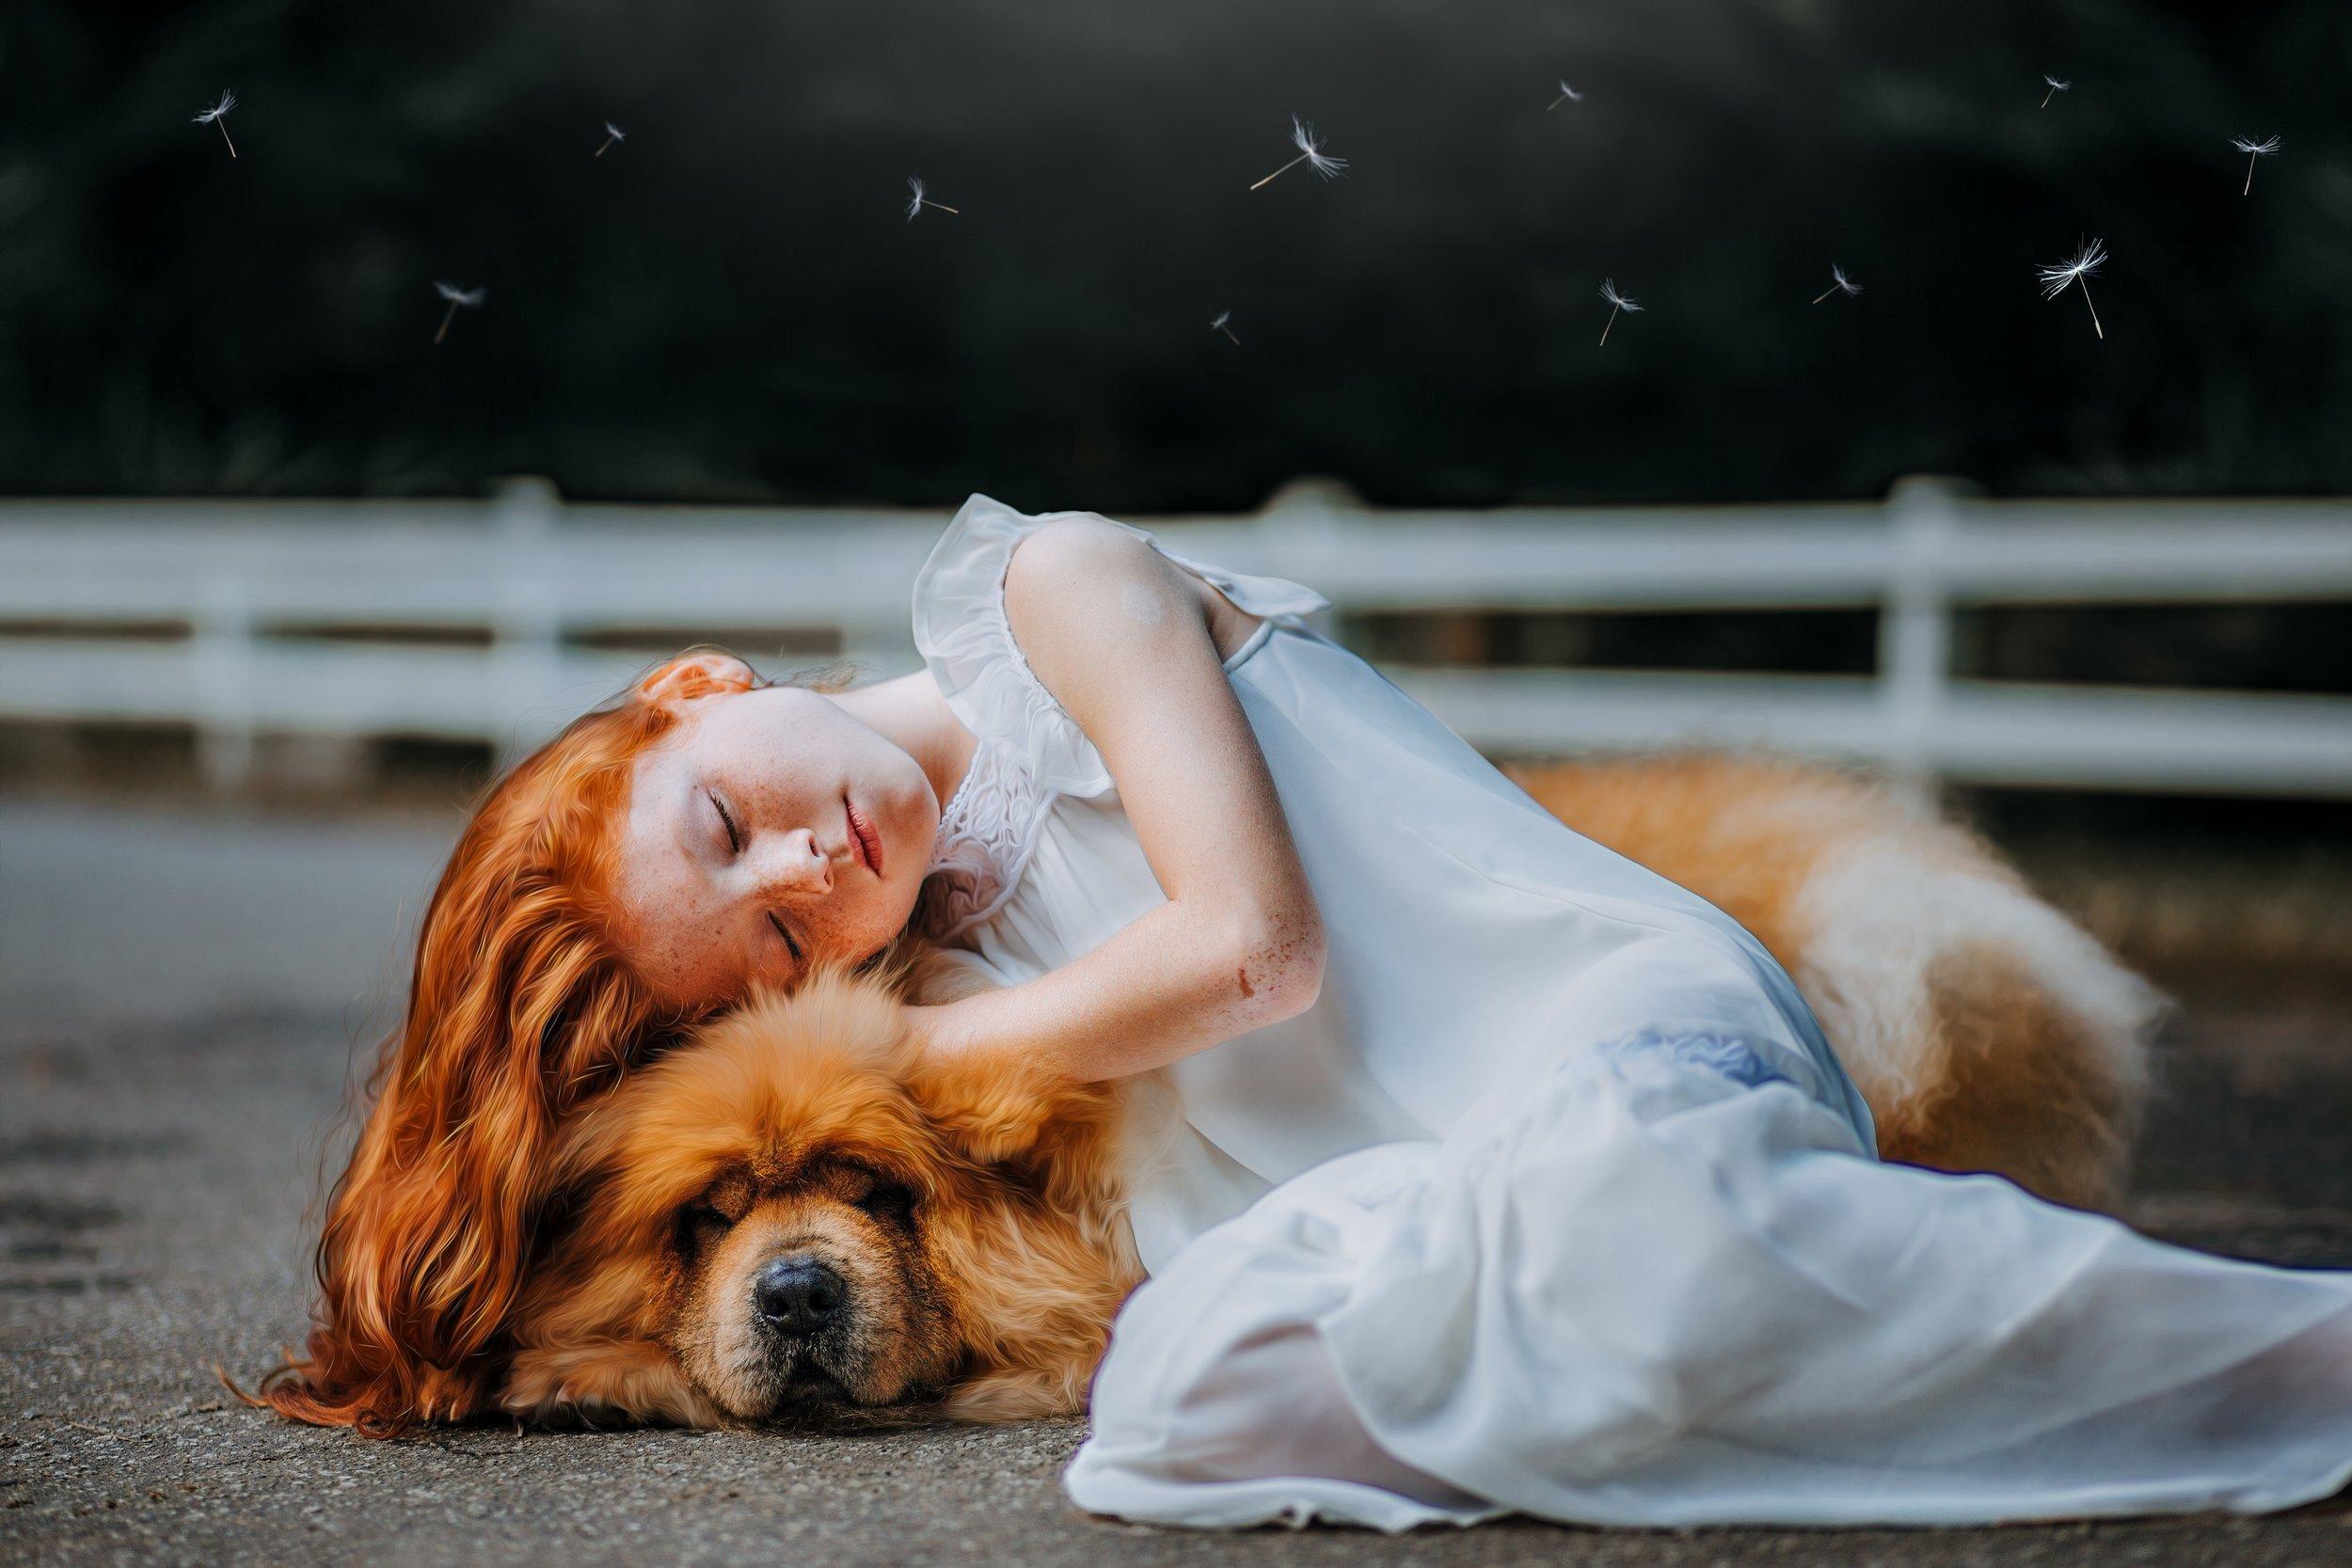 adorable-animal-beautiful-573258.jpg